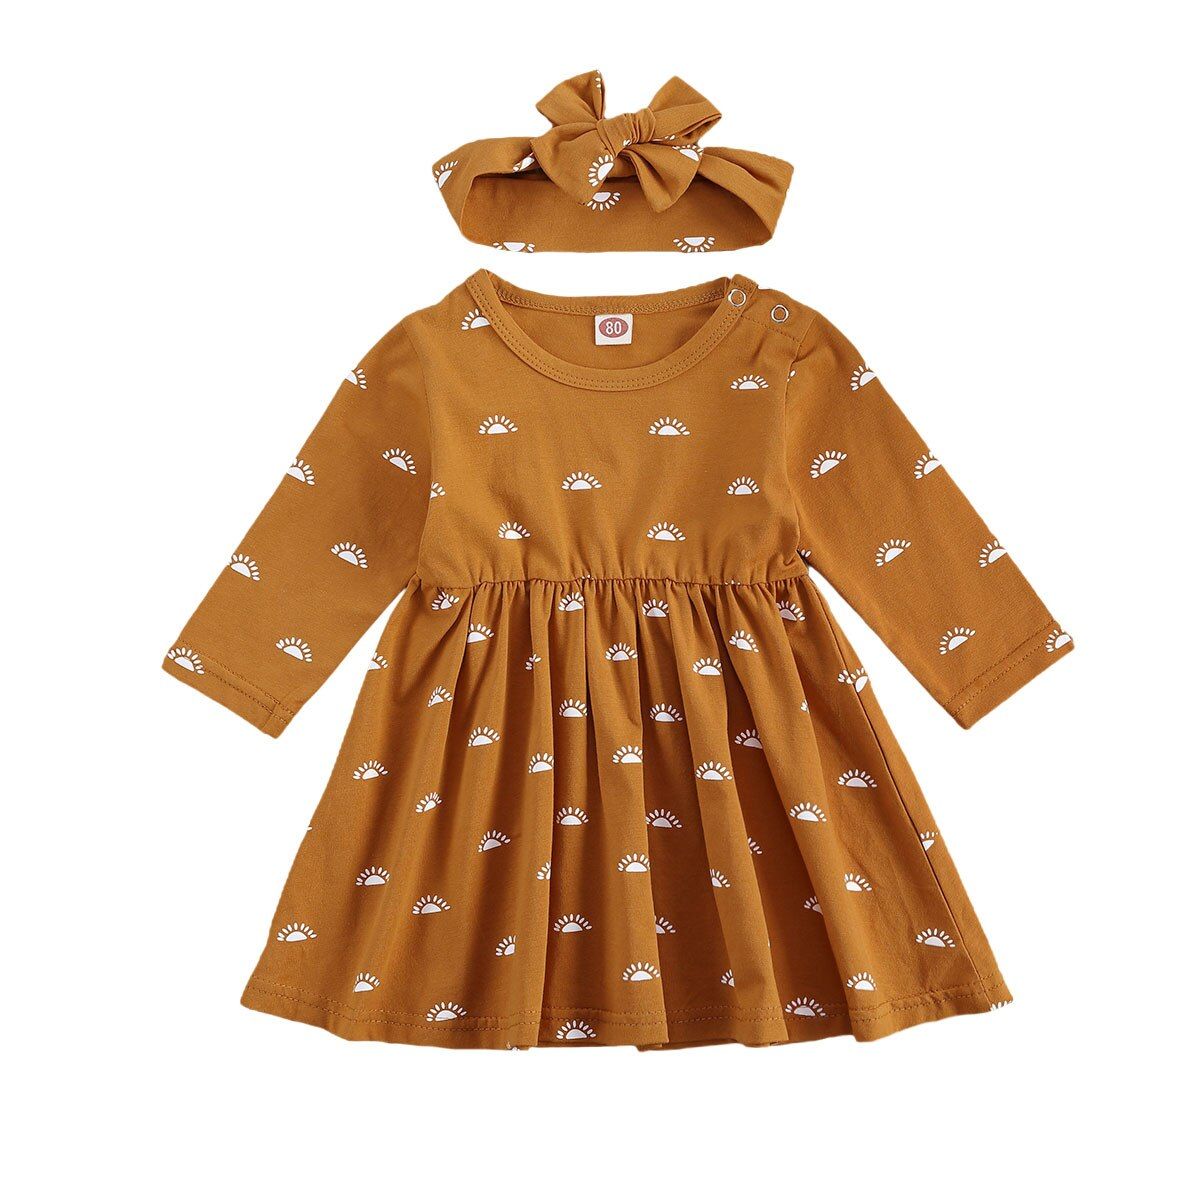 Ma&Baby 0-24M Autumn Sprint Long Sleeve Toddler Infant Baby Girls Dress Newborn Sun Print  Dresses For Girls